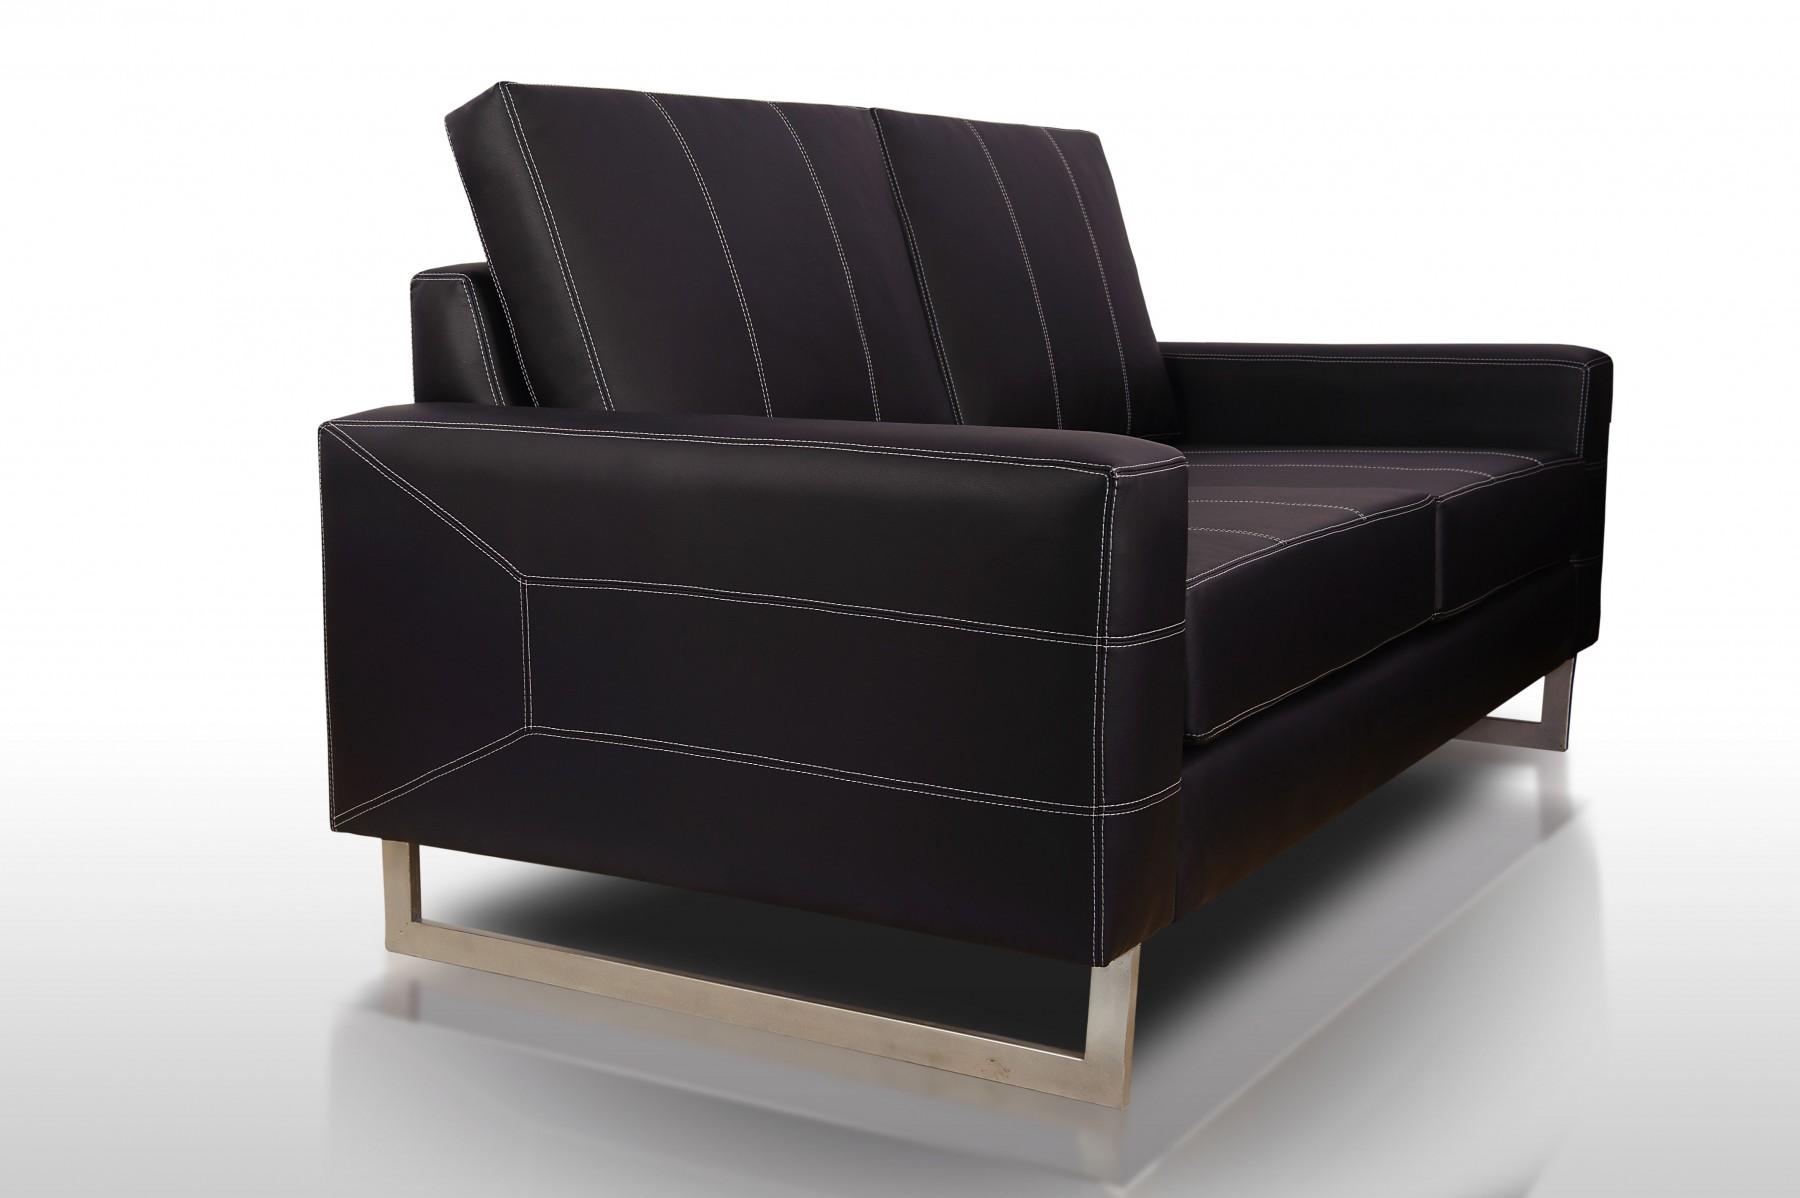 sofa cama individual mexico df how to clean a fabric with baking soda sillon modelo jocker 2 y 3 cuerpos